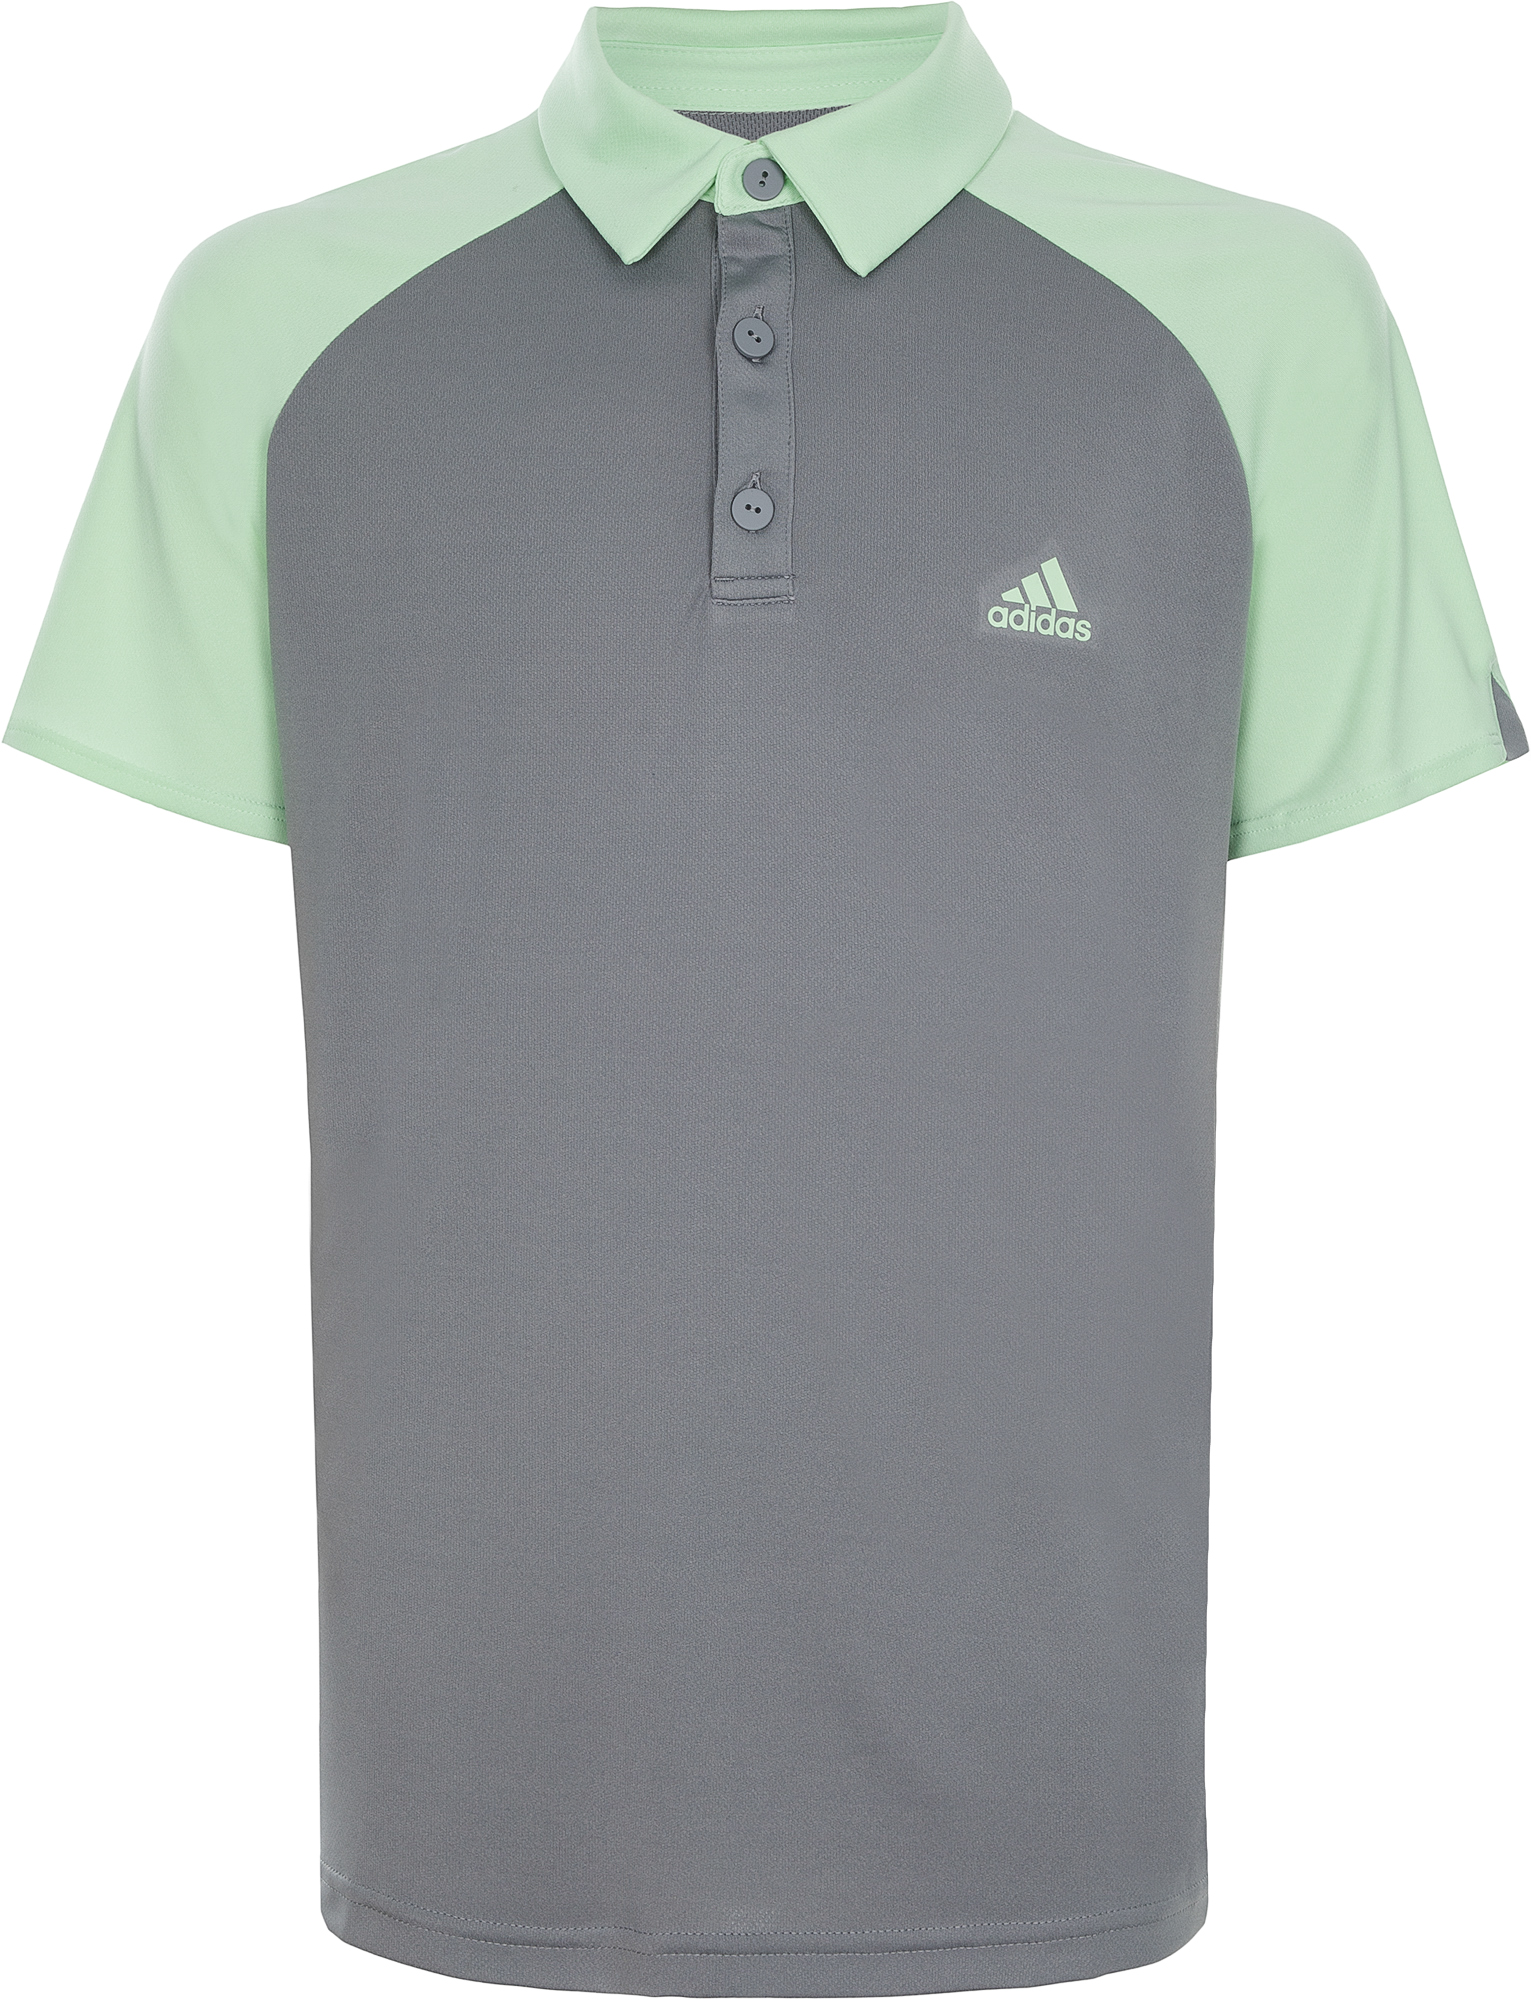 Adidas Поло для мальчиков Adidas Club, размер 170 цена